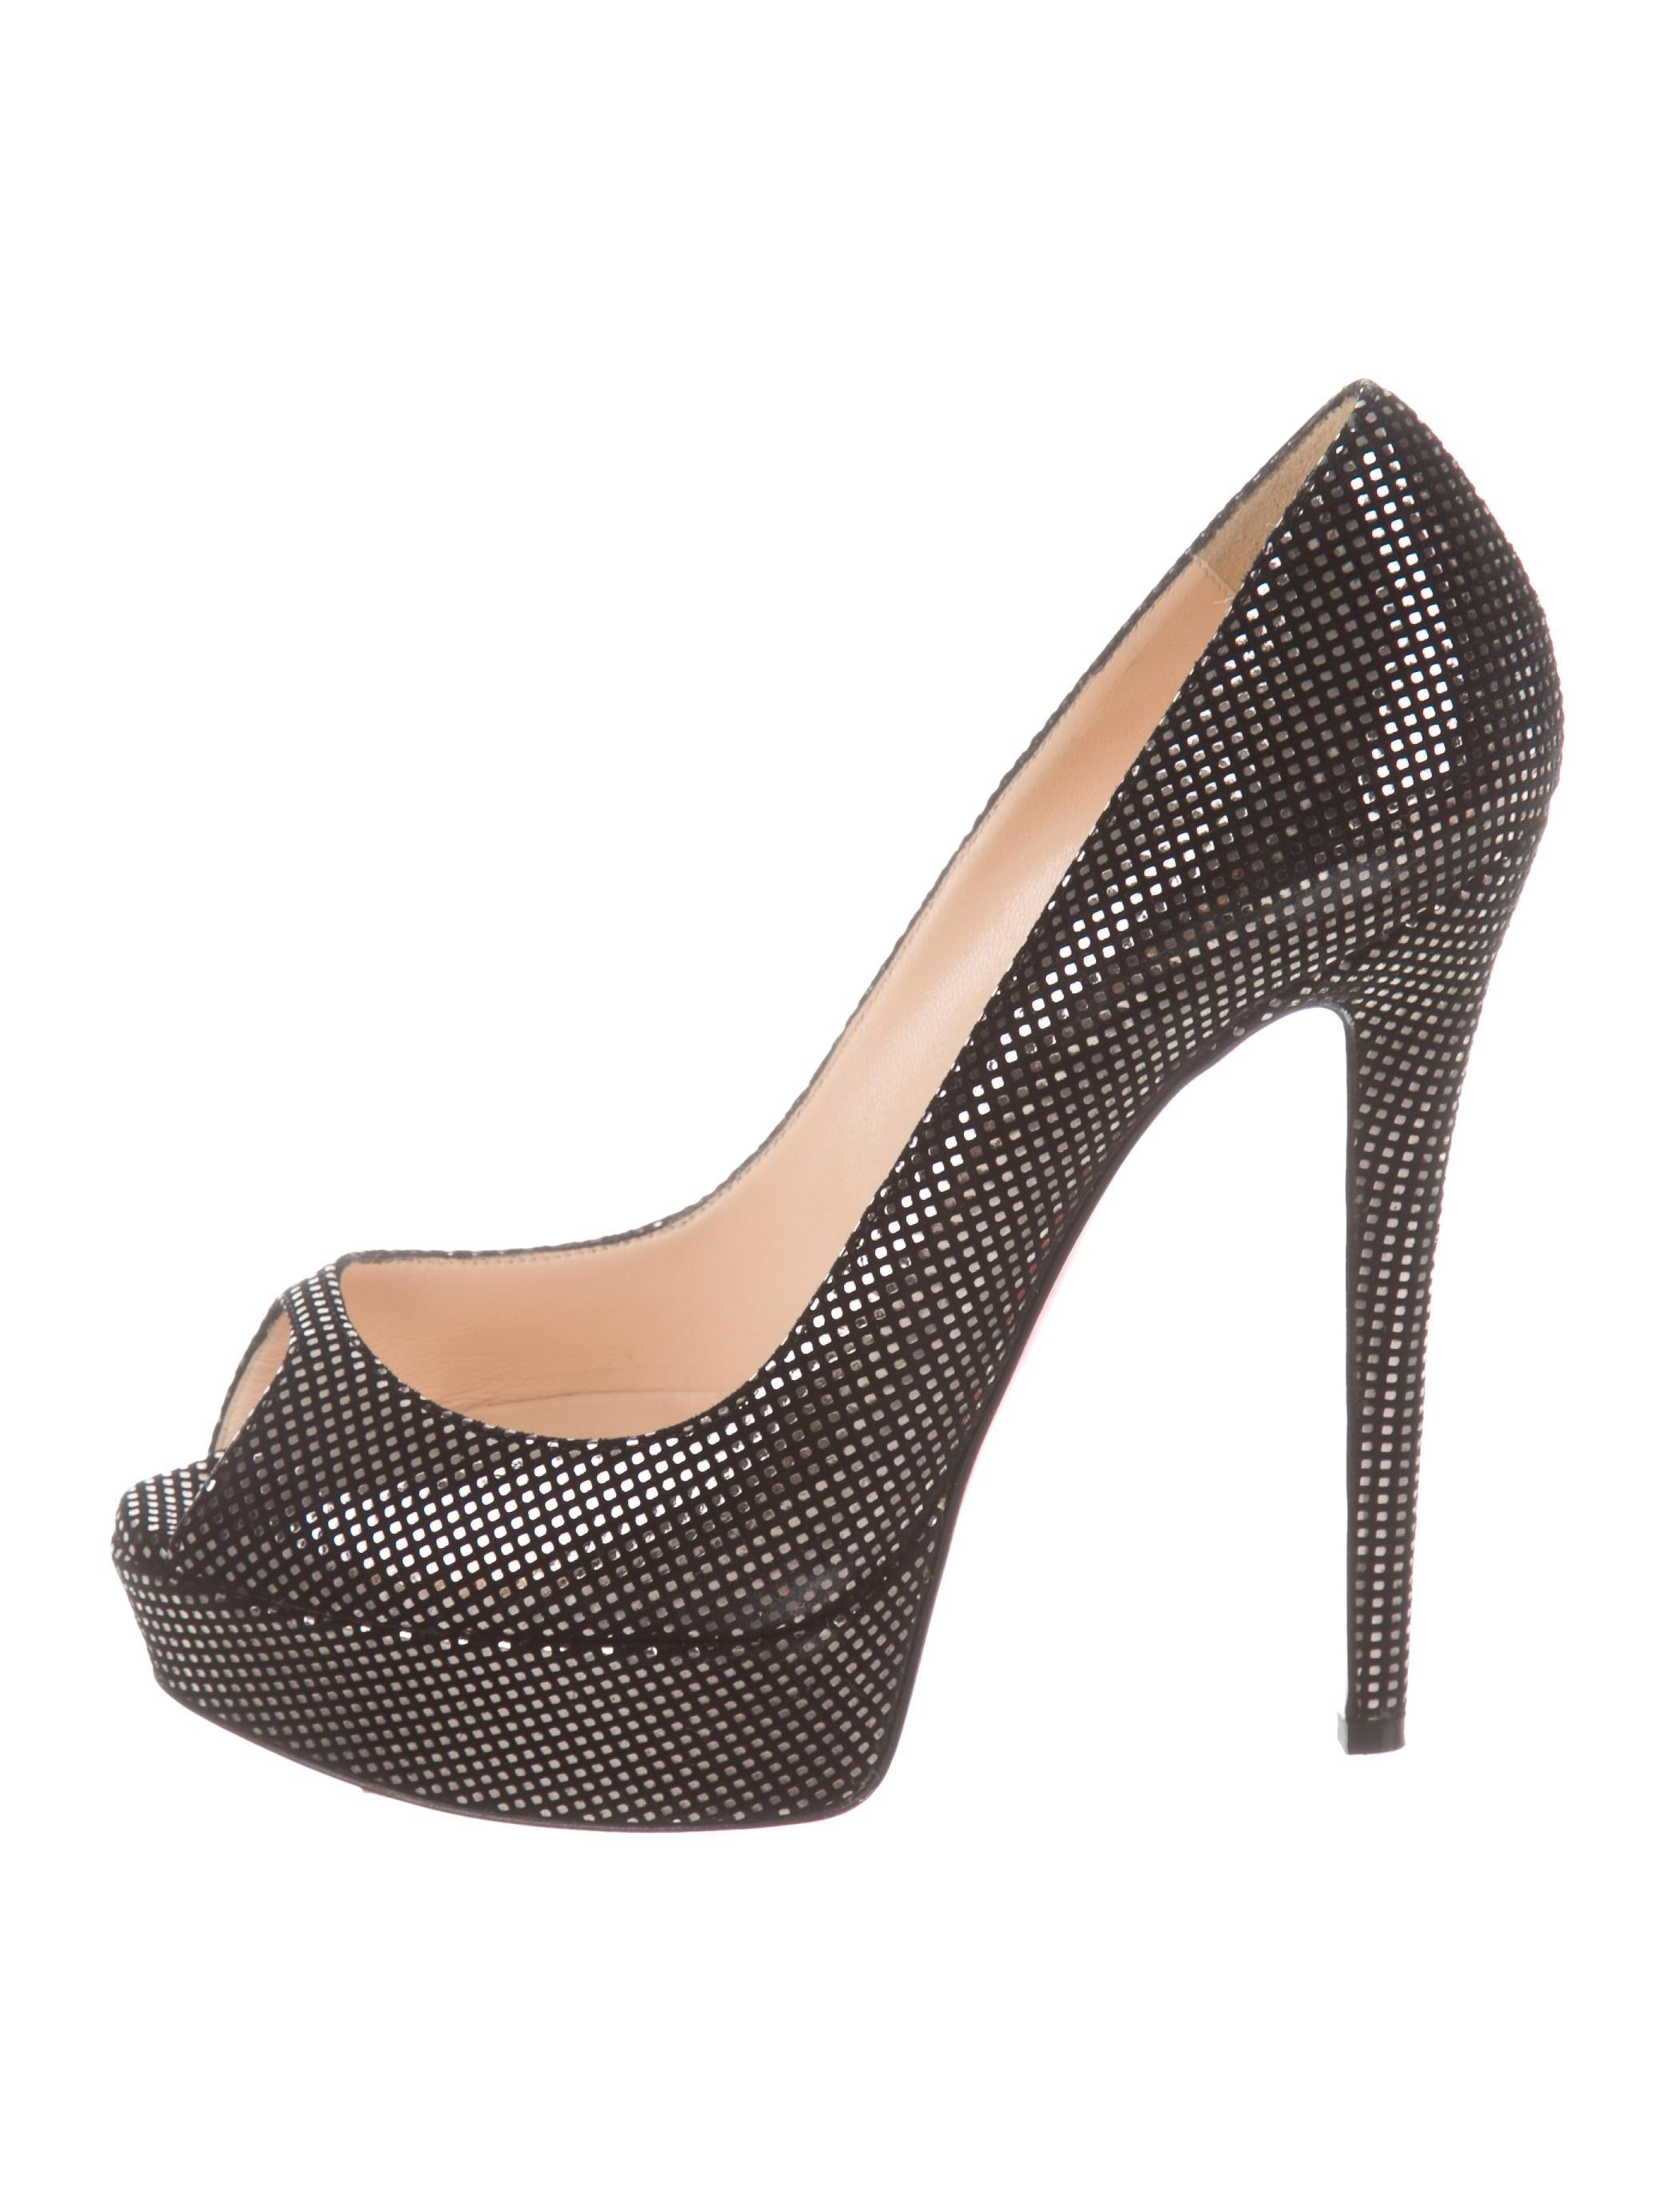 best sneakers b4828 5056b Christian Louboutin Lady Peep Platform Pumps - Shoes ...